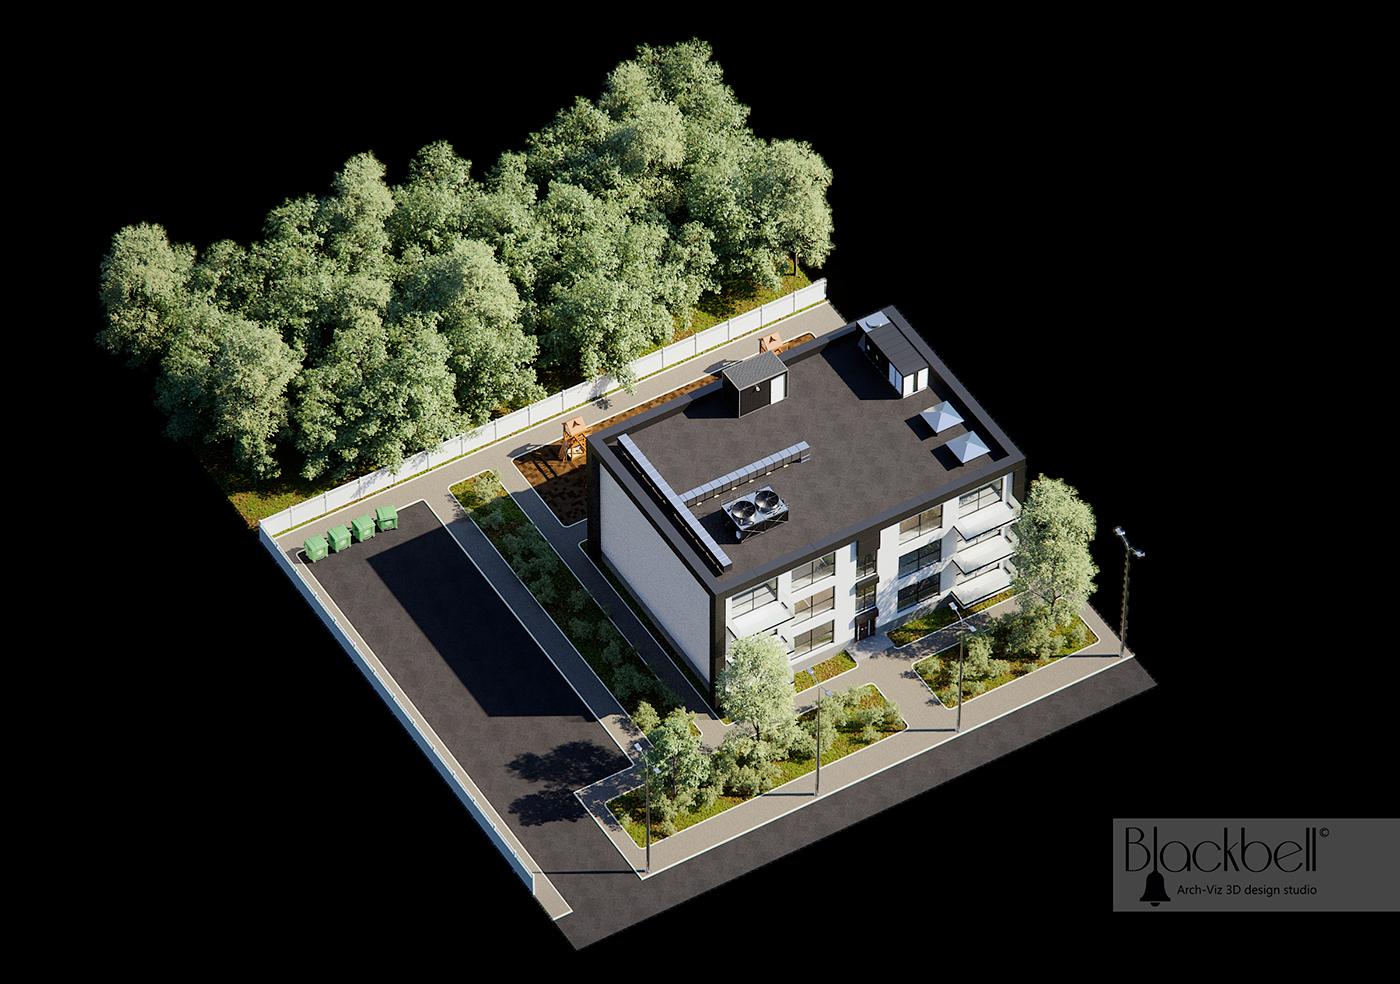 exterior design 3dsmax corona-renderer modular tileble